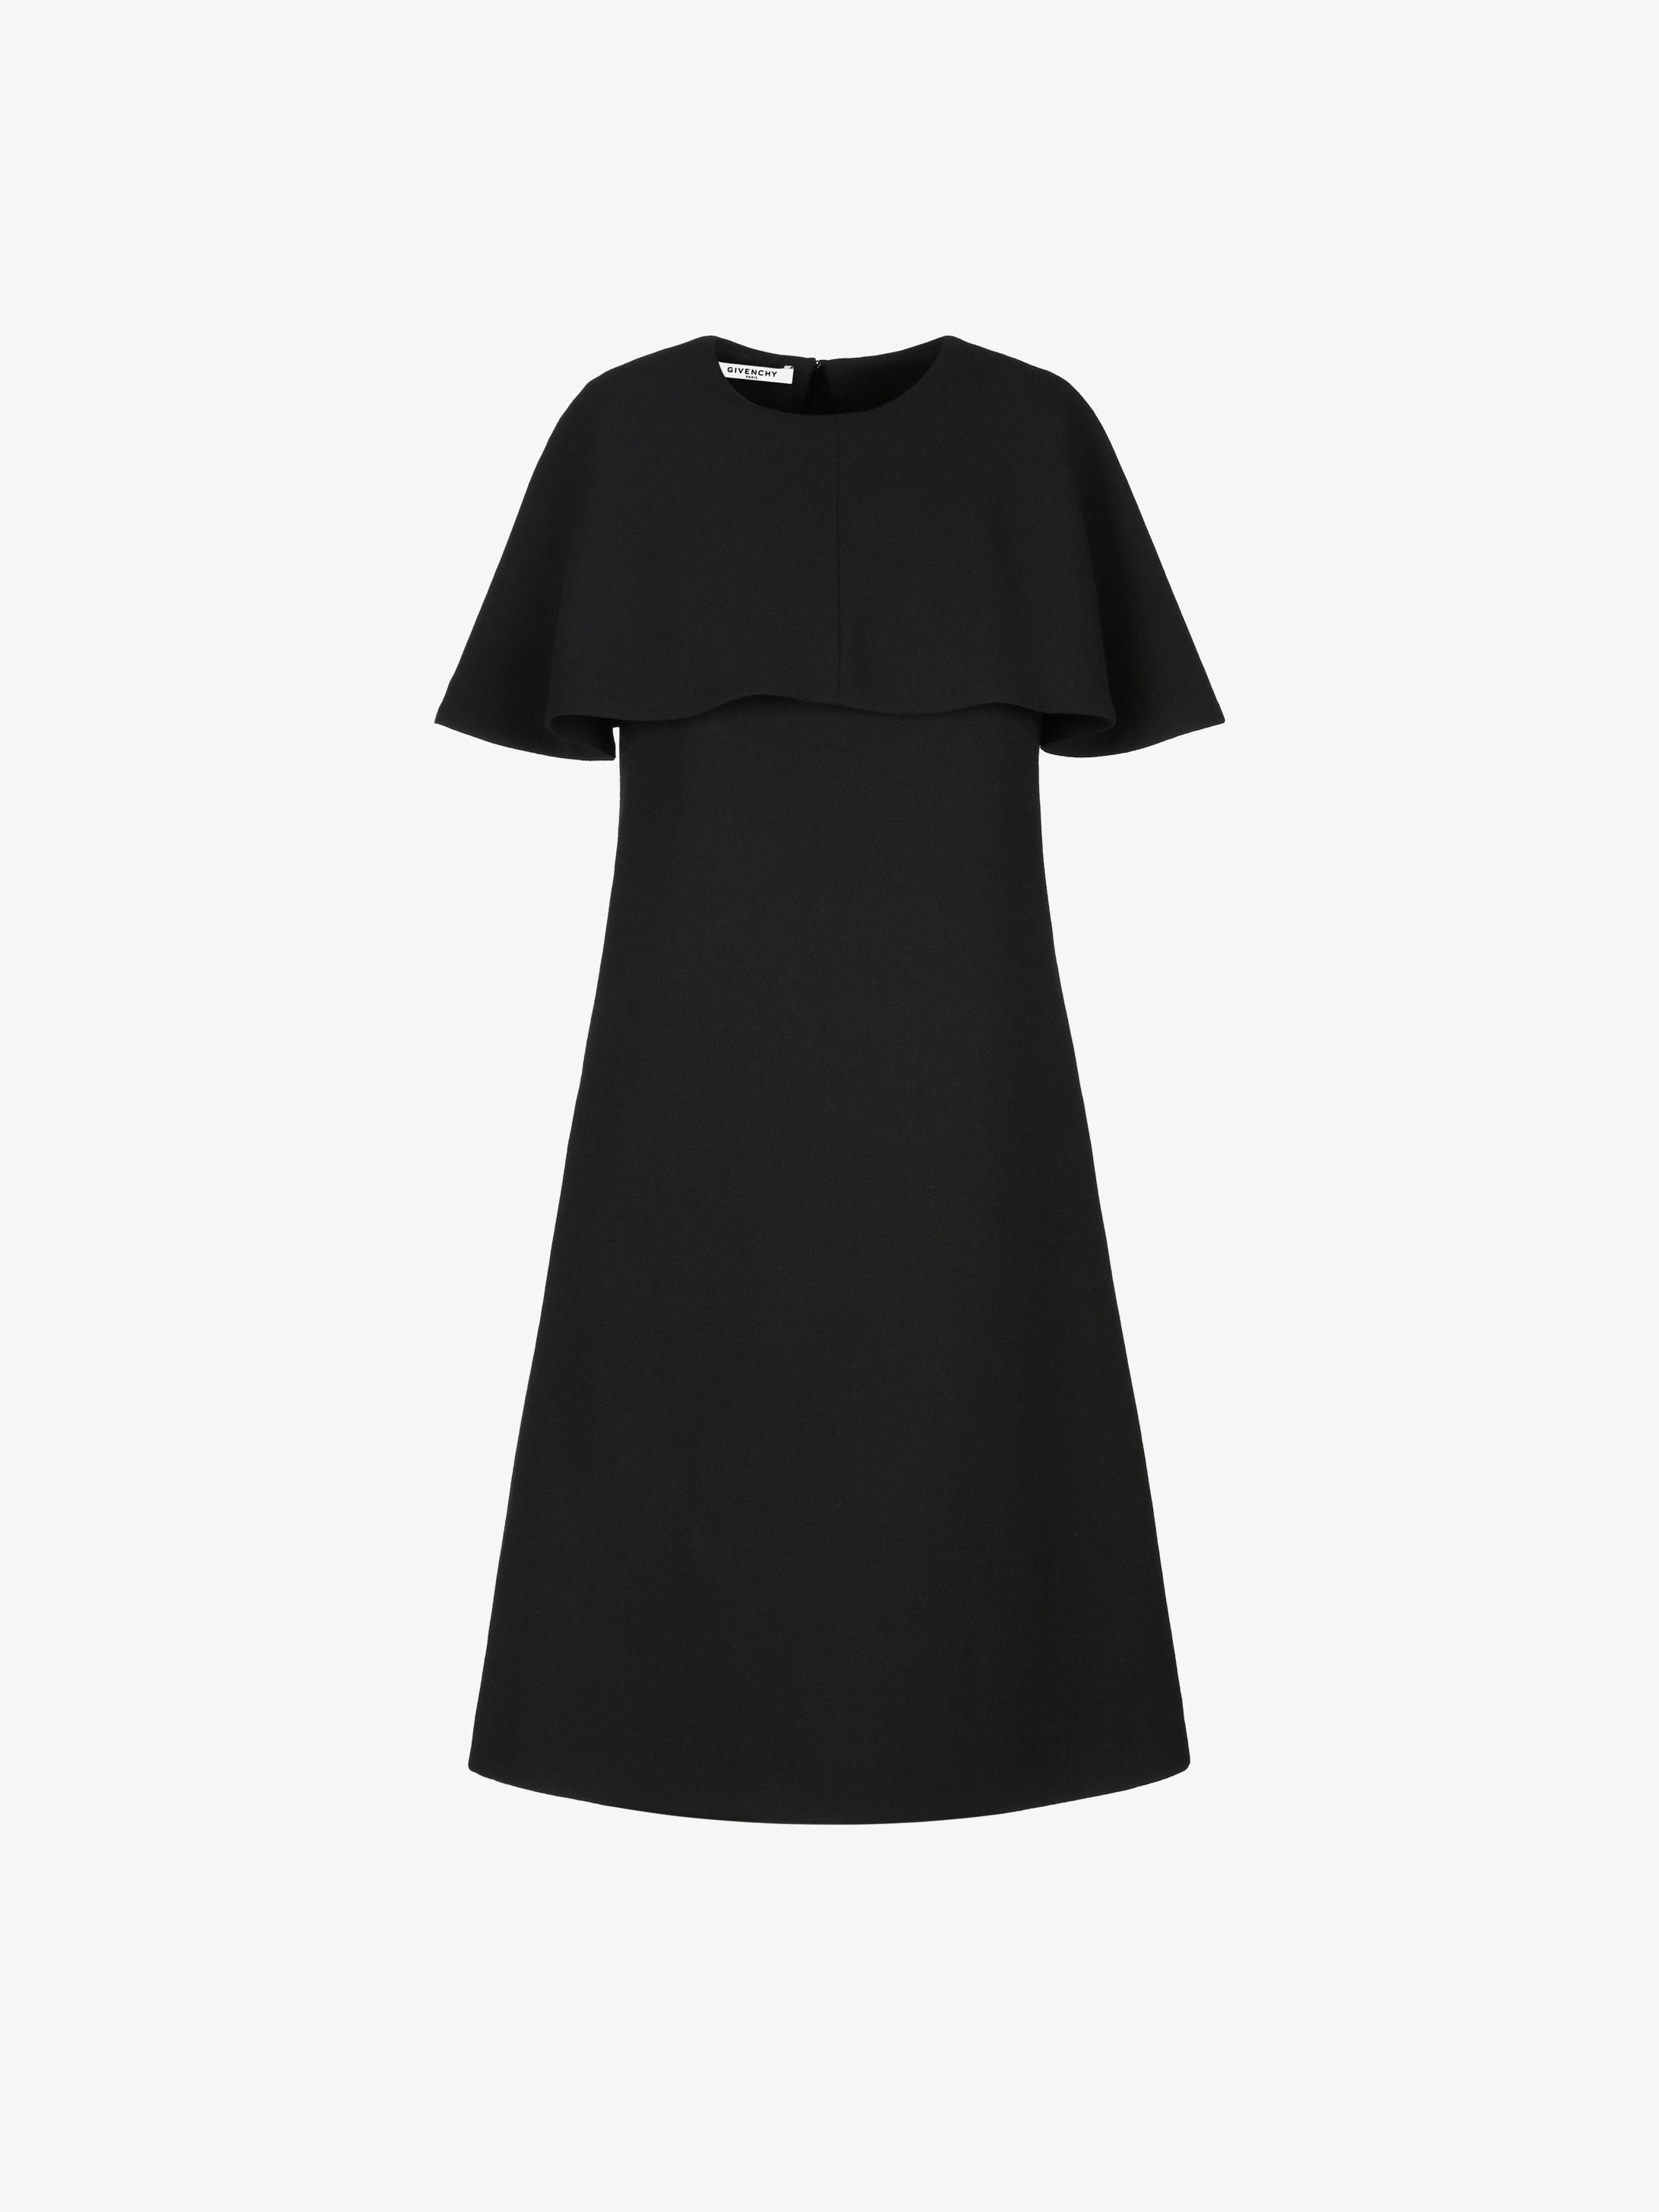 Short cape dress in wool crepe